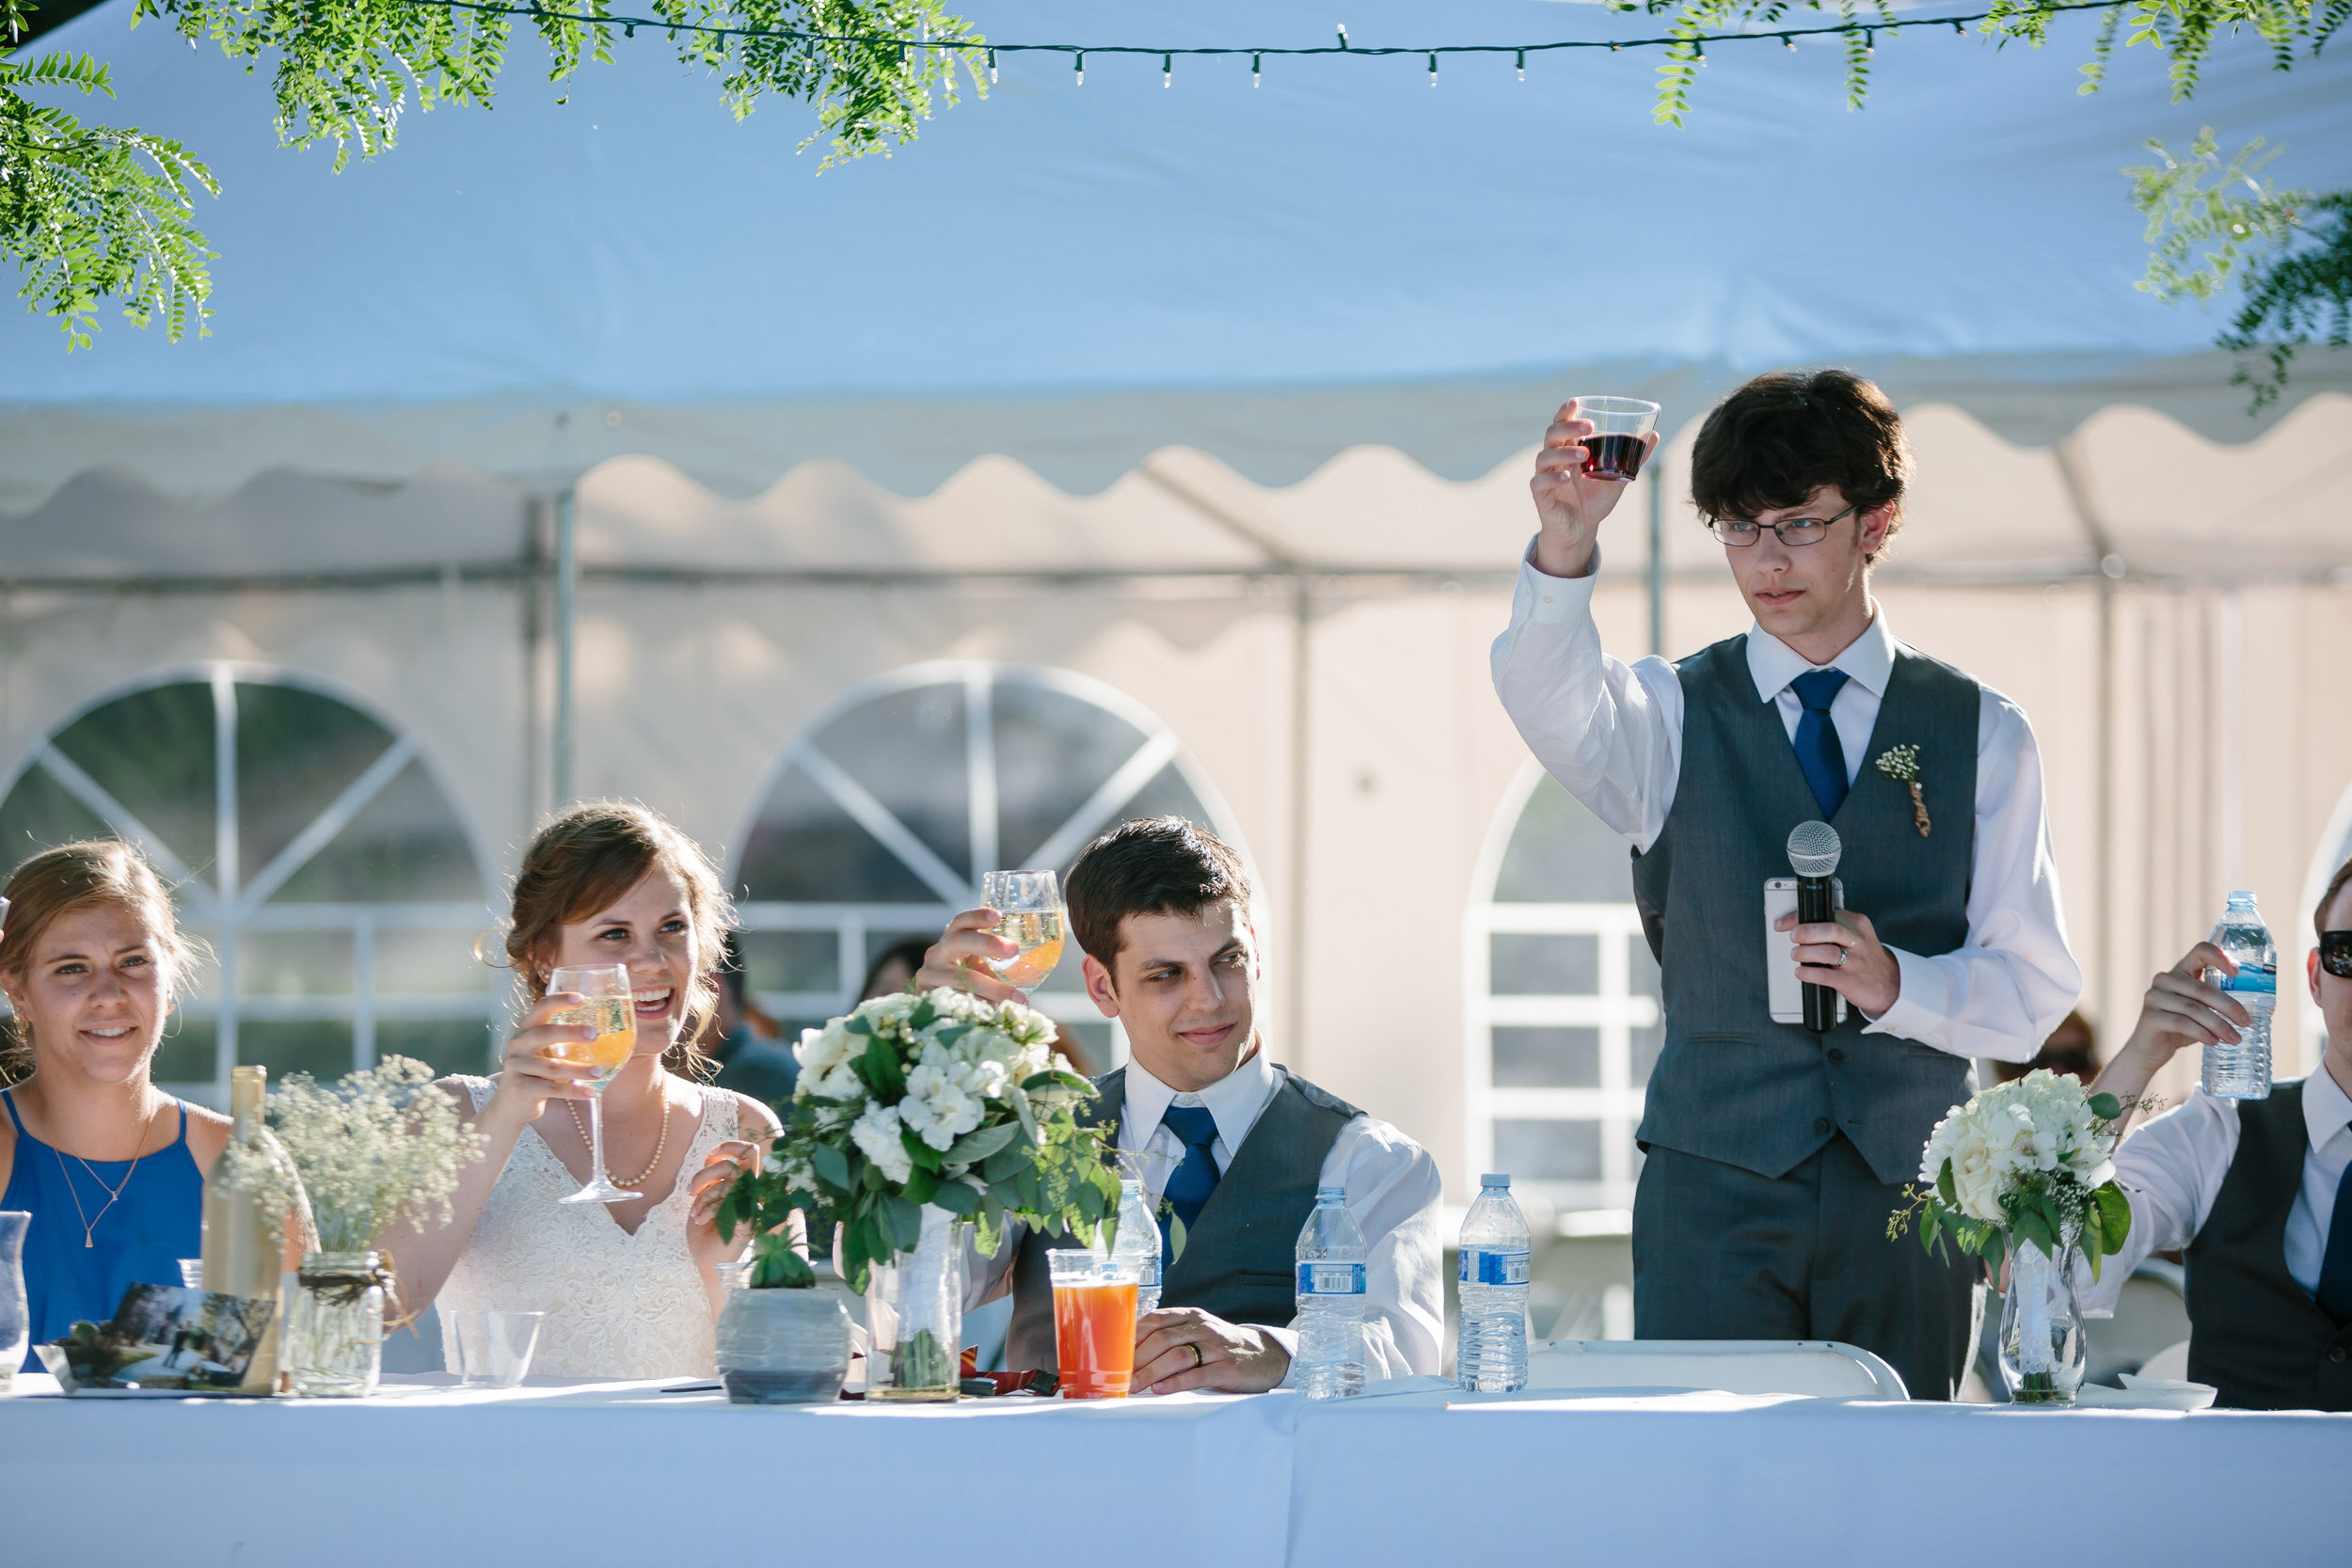 Jordan & Shantel Married - Idaho - Corrie Mick Photography-271.jpg